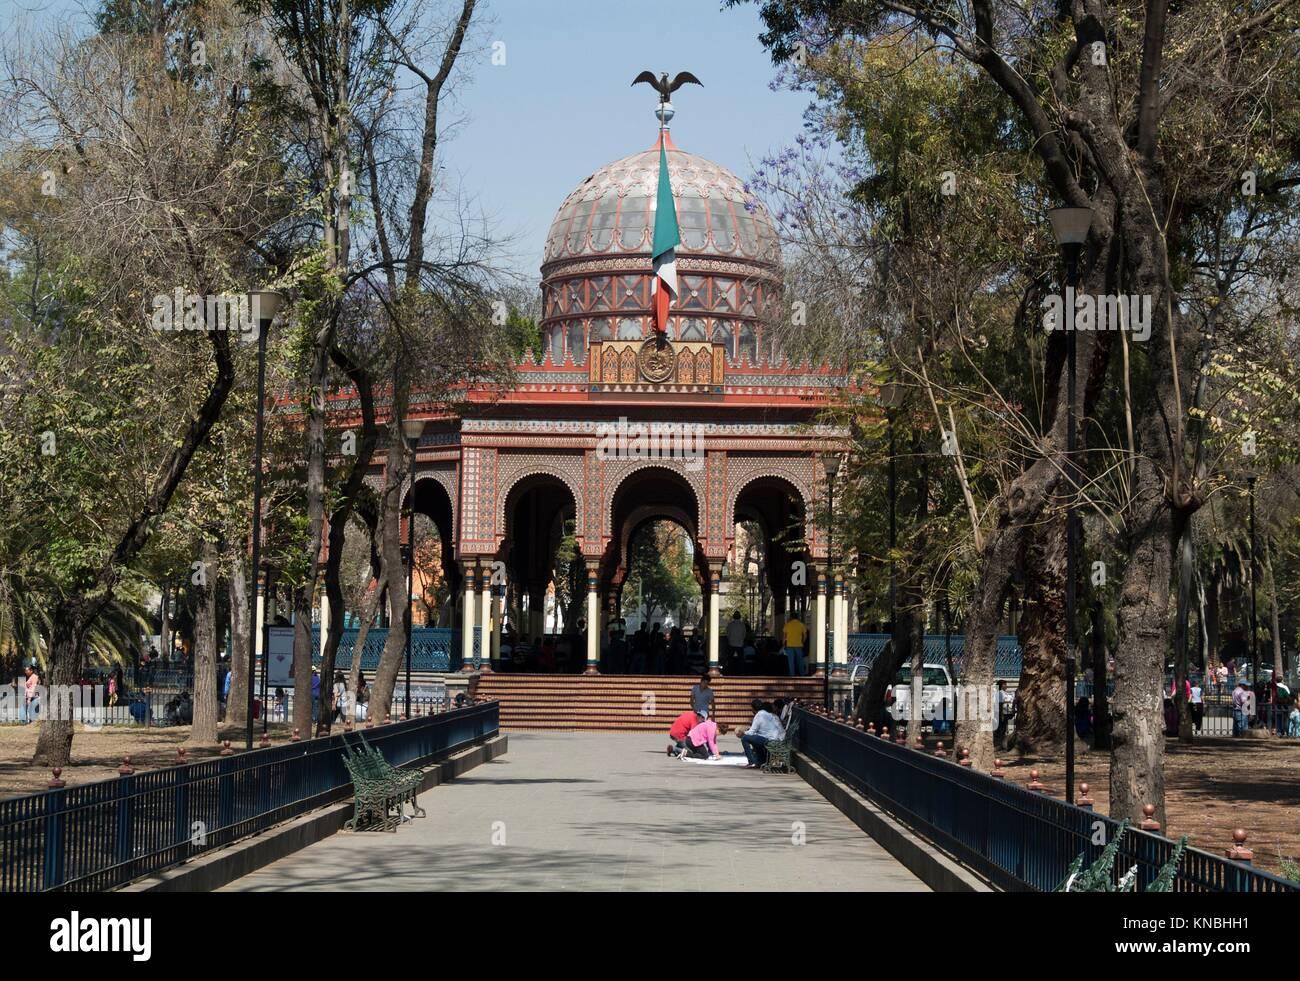 Morisco Kiosk in Alameda de Santa Maria La Ribera, plaza in Mexico City, Mexico. - Stock Image